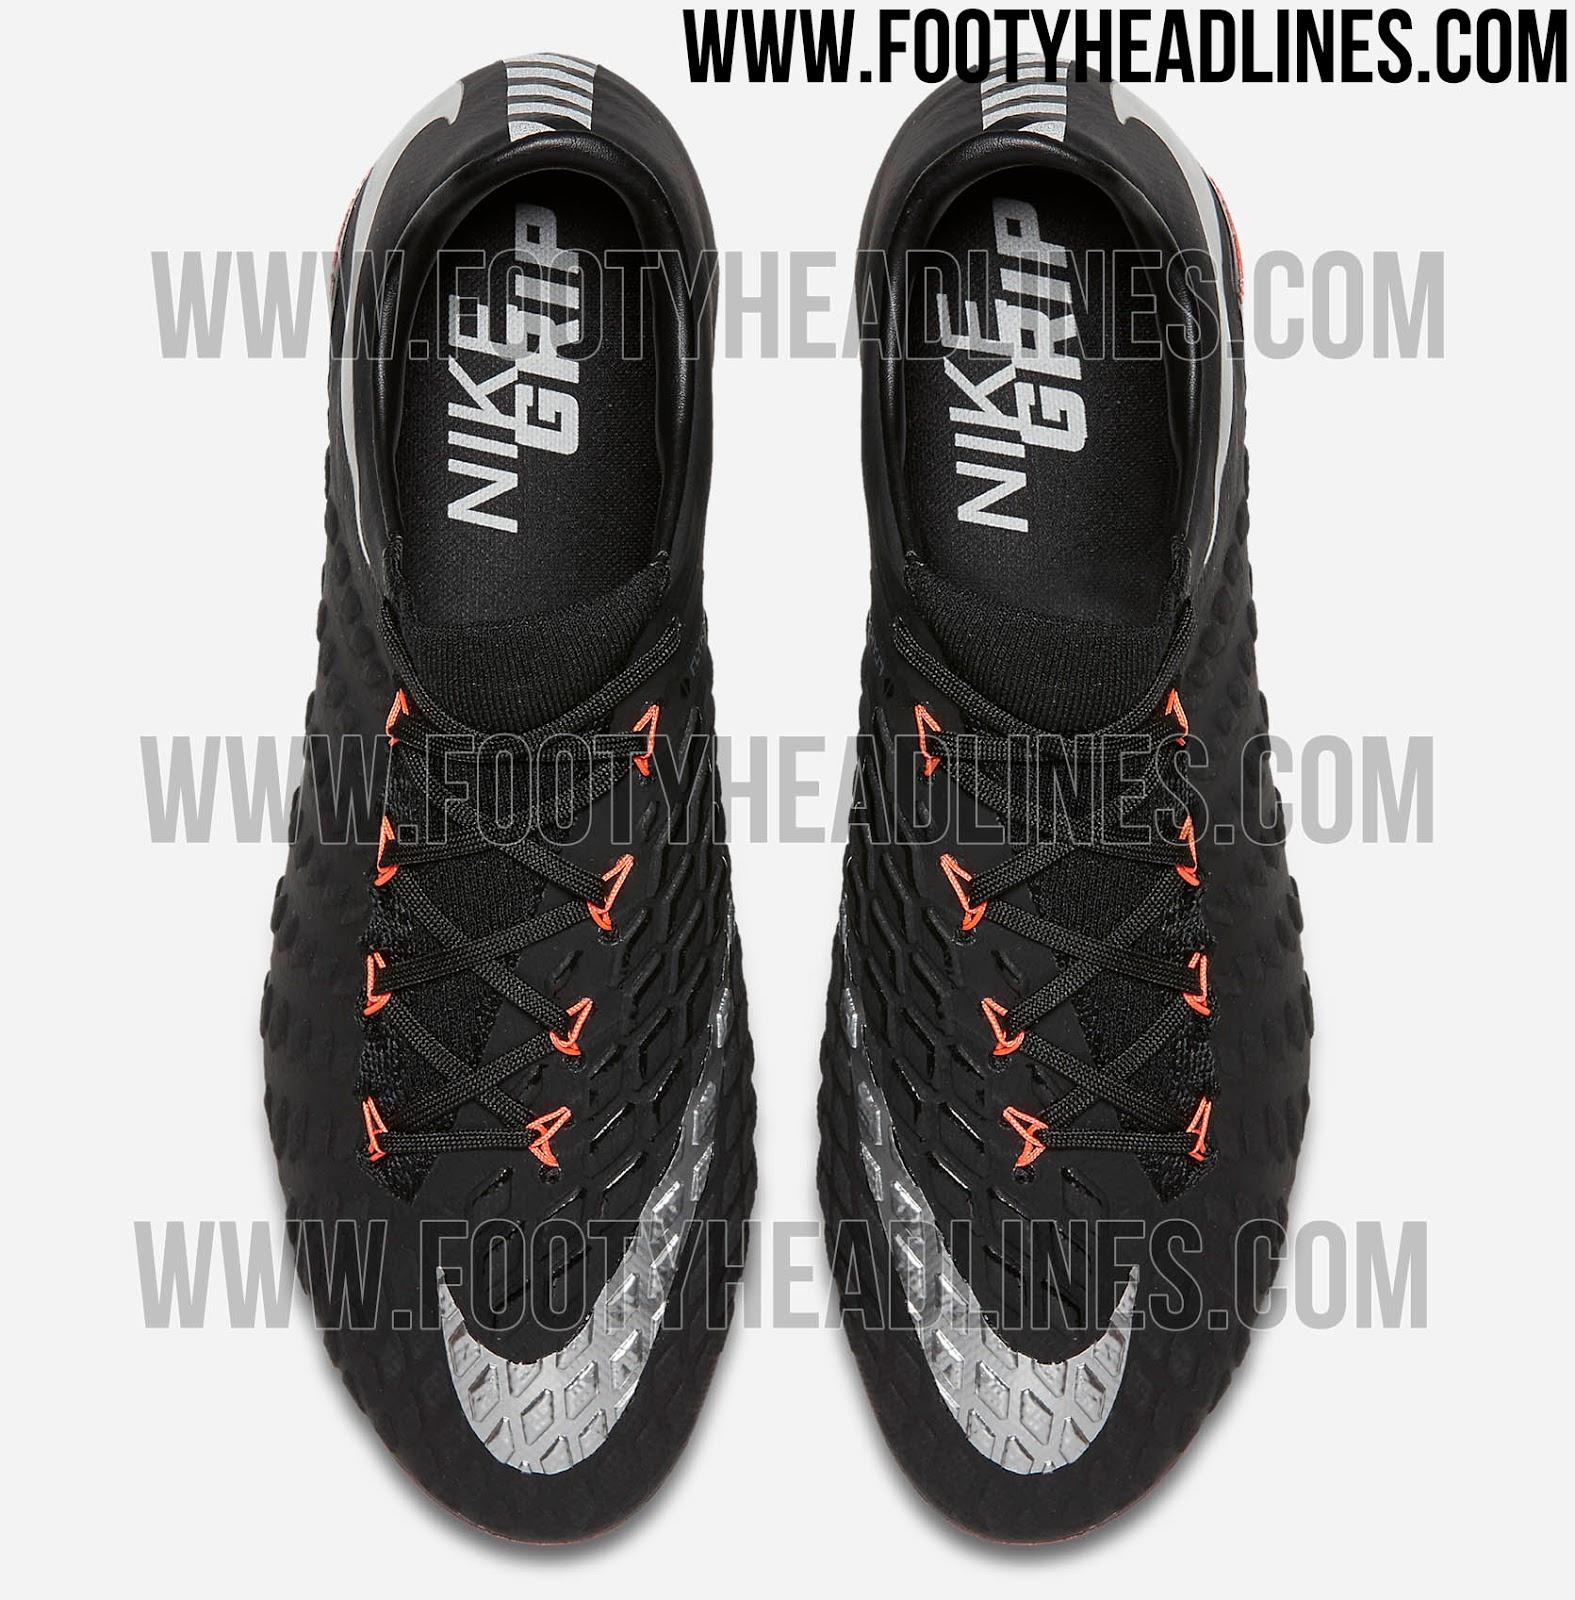 Soccer Nike Hypervenom Phantom III DF FG Footwear